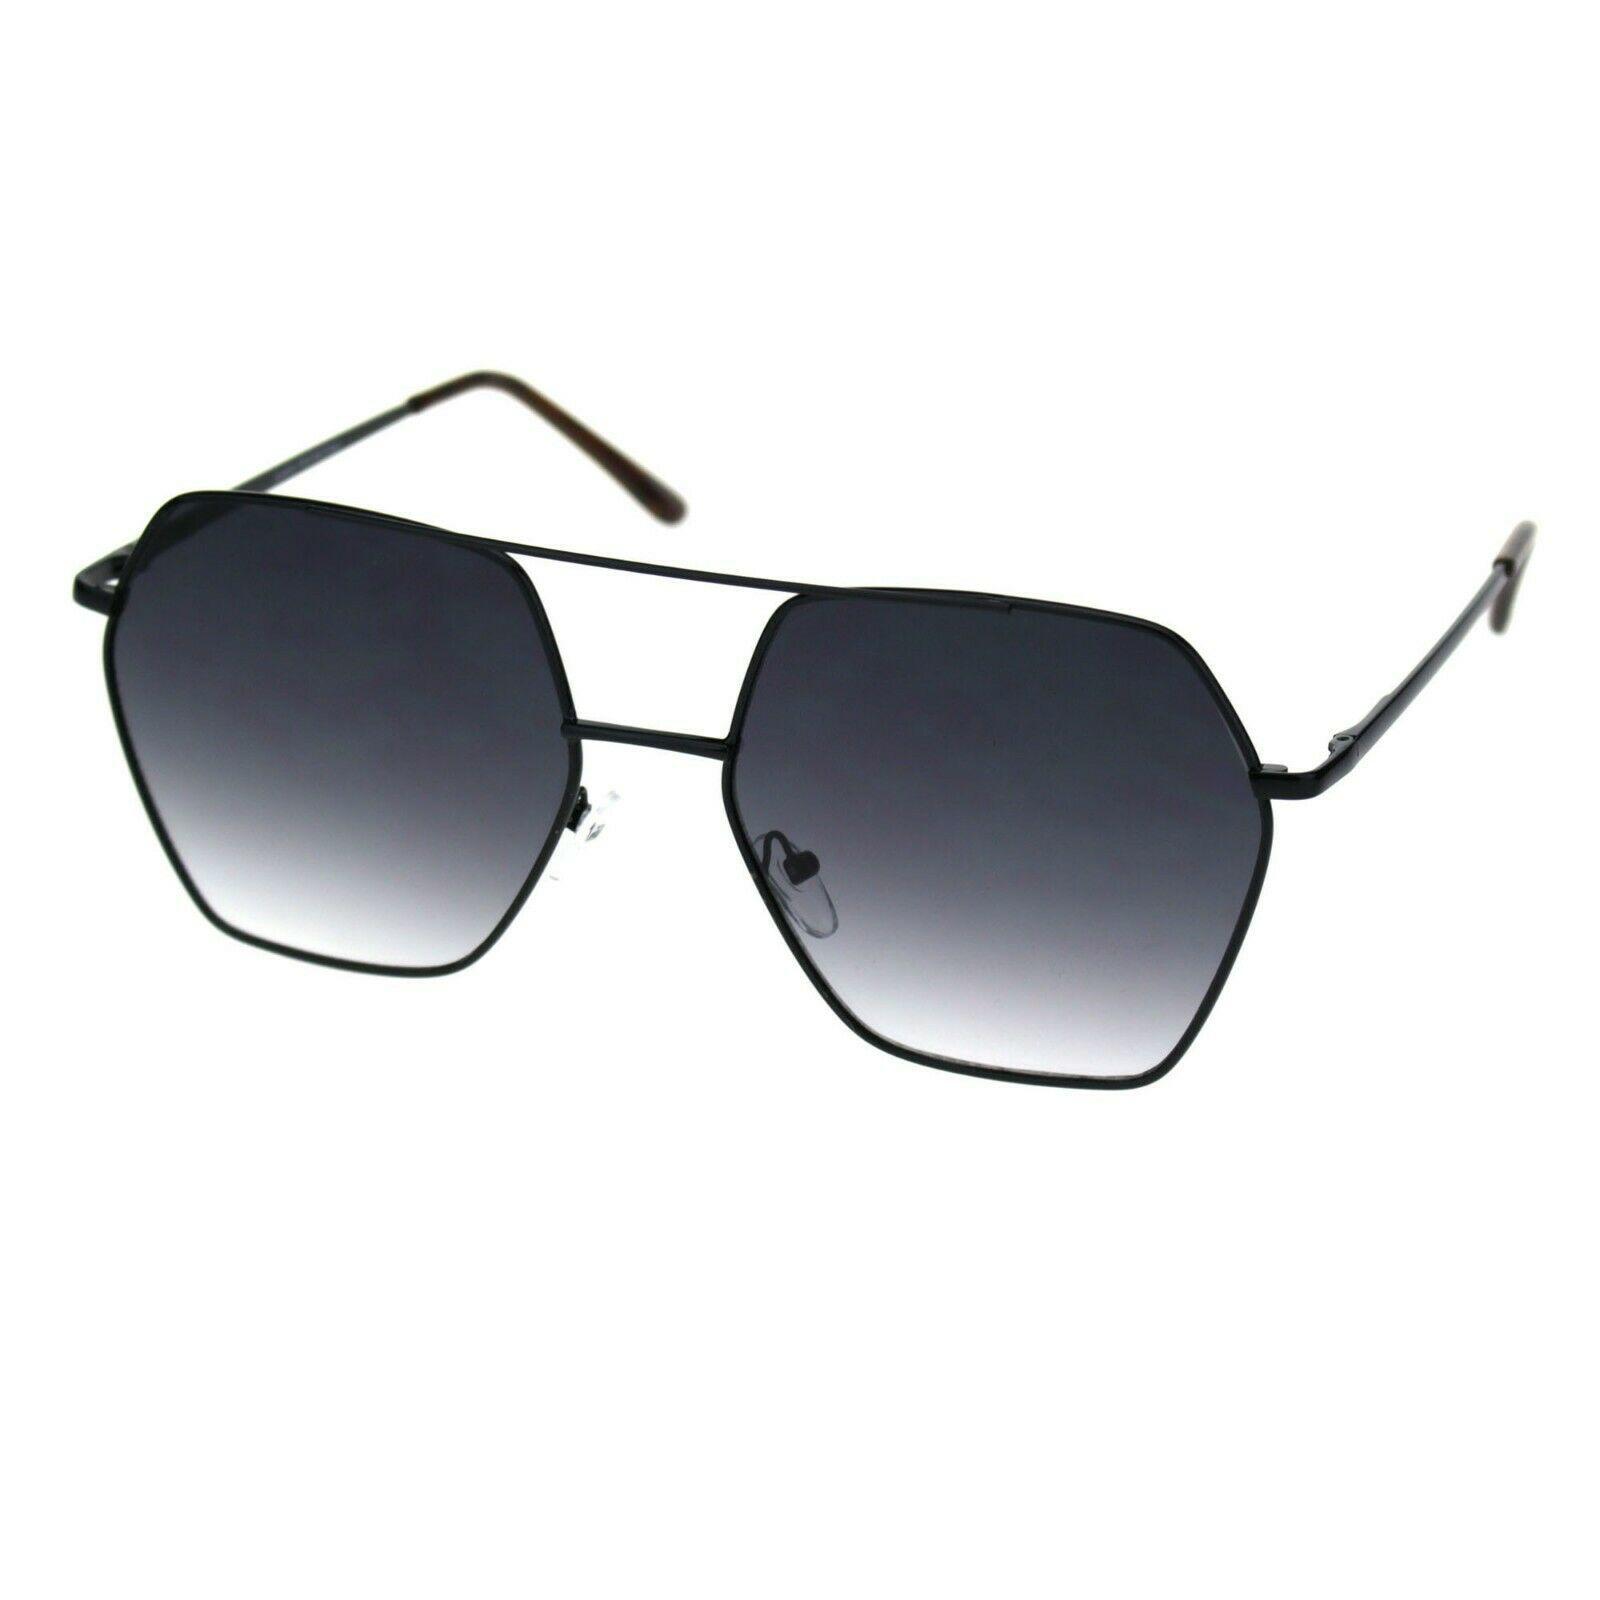 Womens Hexagon Shape Sunglasses Double Bridge Metal Frame UV 400